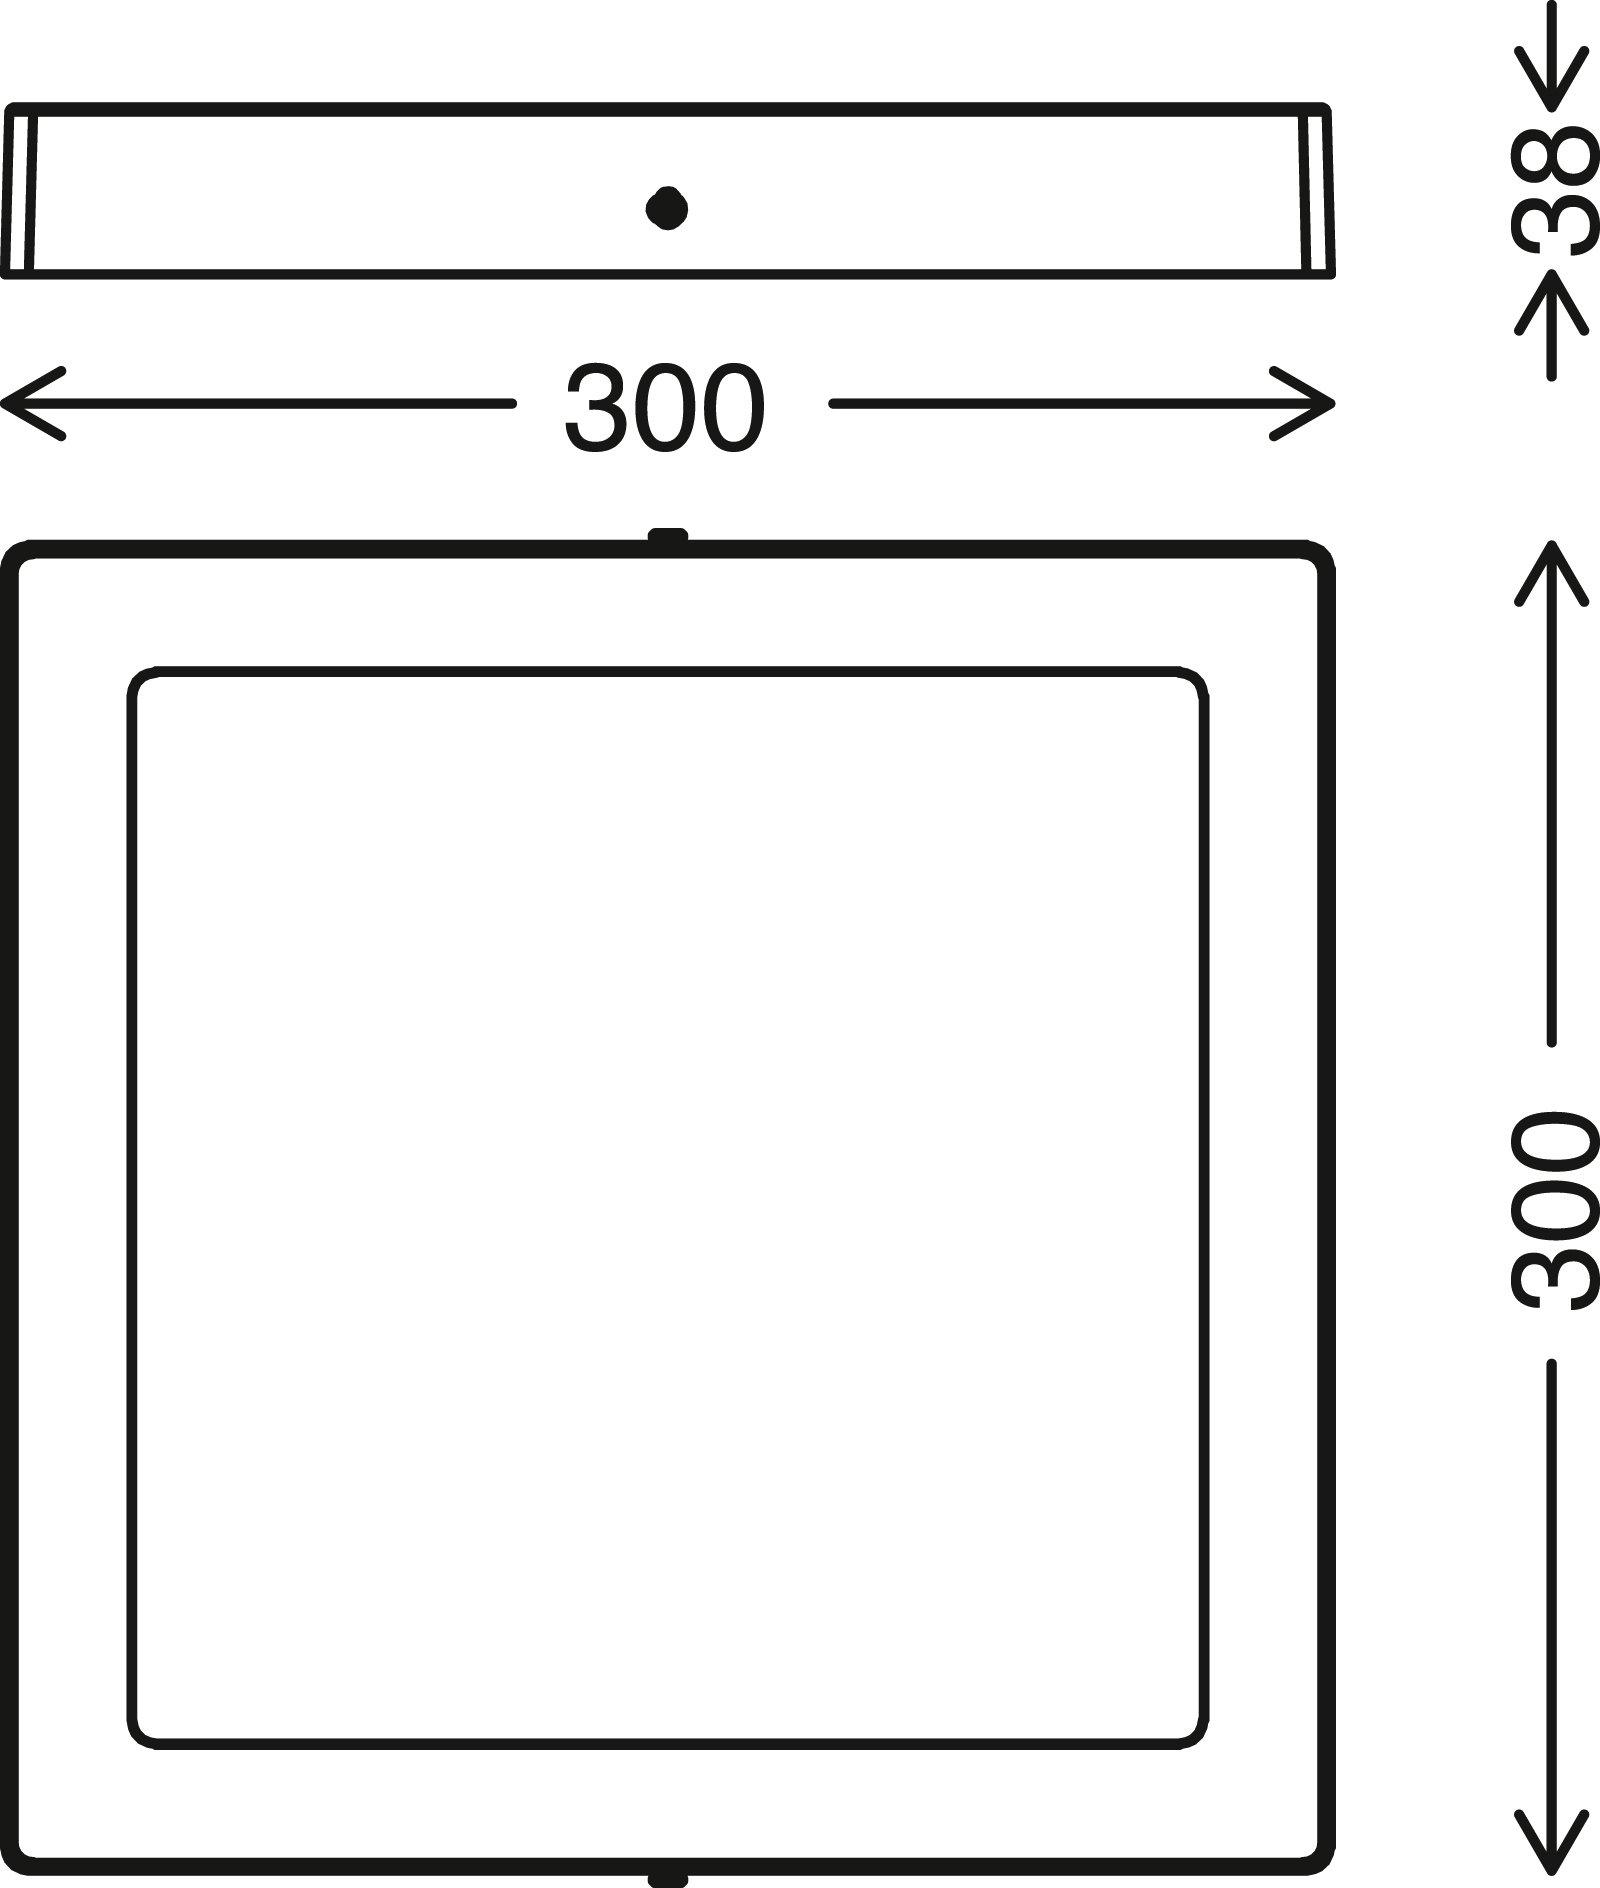 TELEFUNKEN Smart LED Aufbauleuchte, 30 cm, 23 W, Weiss